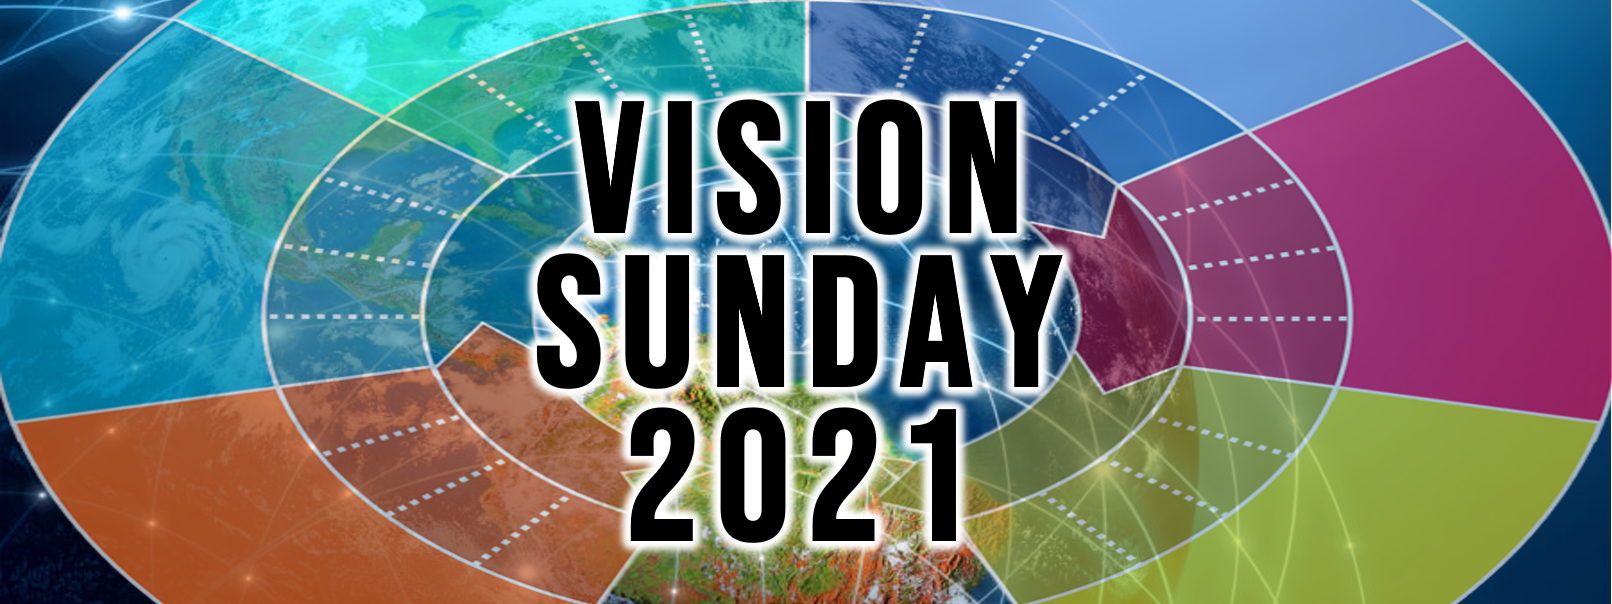 Kids Church Handout for Sunday 7 Feb - Vision Sunday